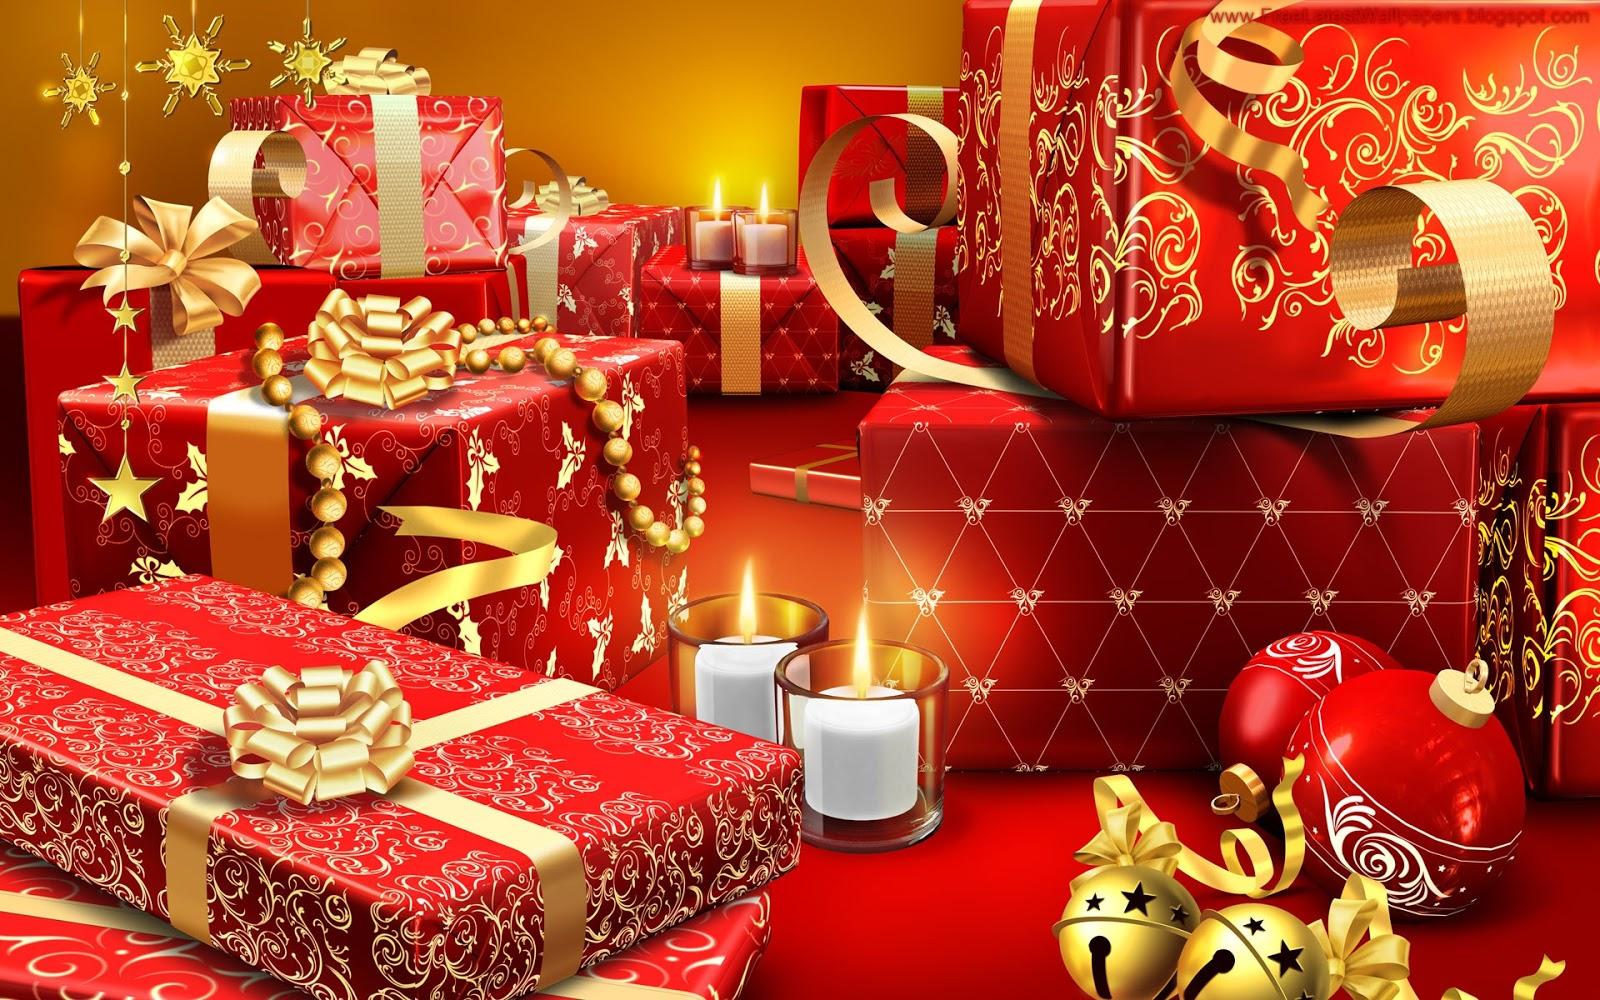 http://2.bp.blogspot.com/-Njo861rygCc/TtjSrXpDh-I/AAAAAAAAB4s/FV1z5knc5aE/s1600/Christmas+HD+Wallpapers+1920x1200+%25281%2529.jpg